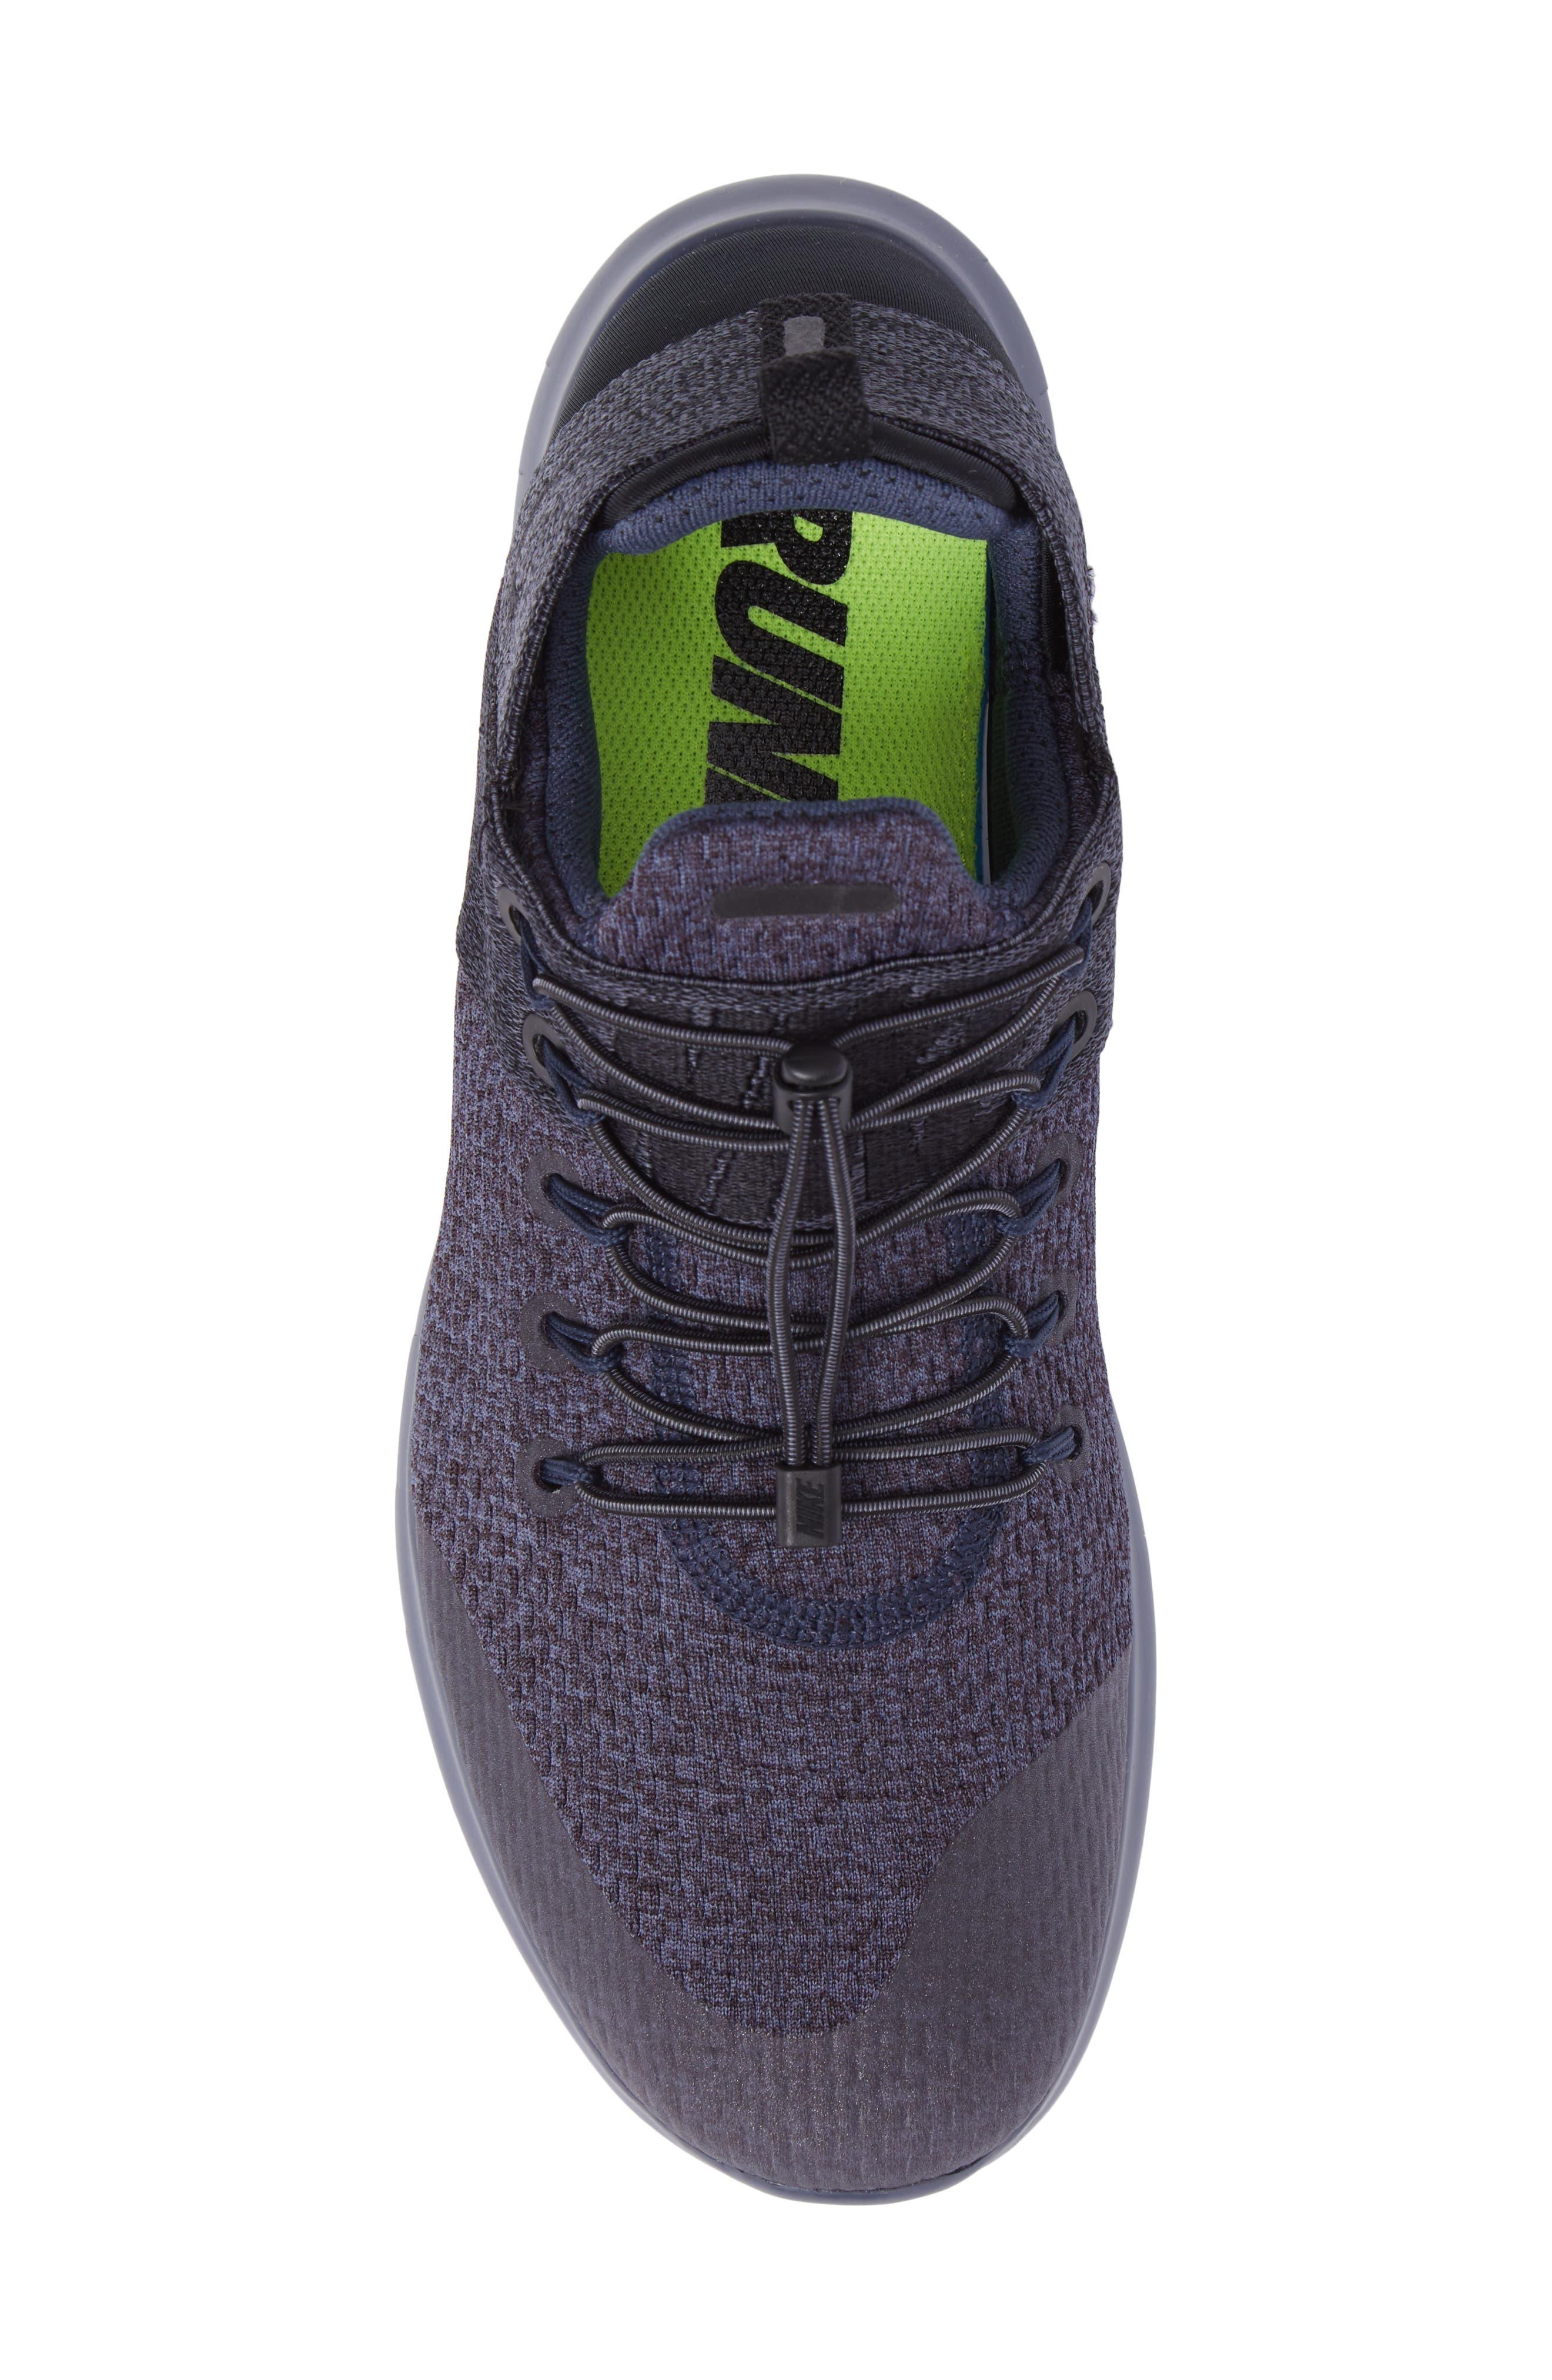 Free RN Commuter 2017 Premium Running Shoe,                             Alternate thumbnail 5, color,                             Light Carbon/Port Wine